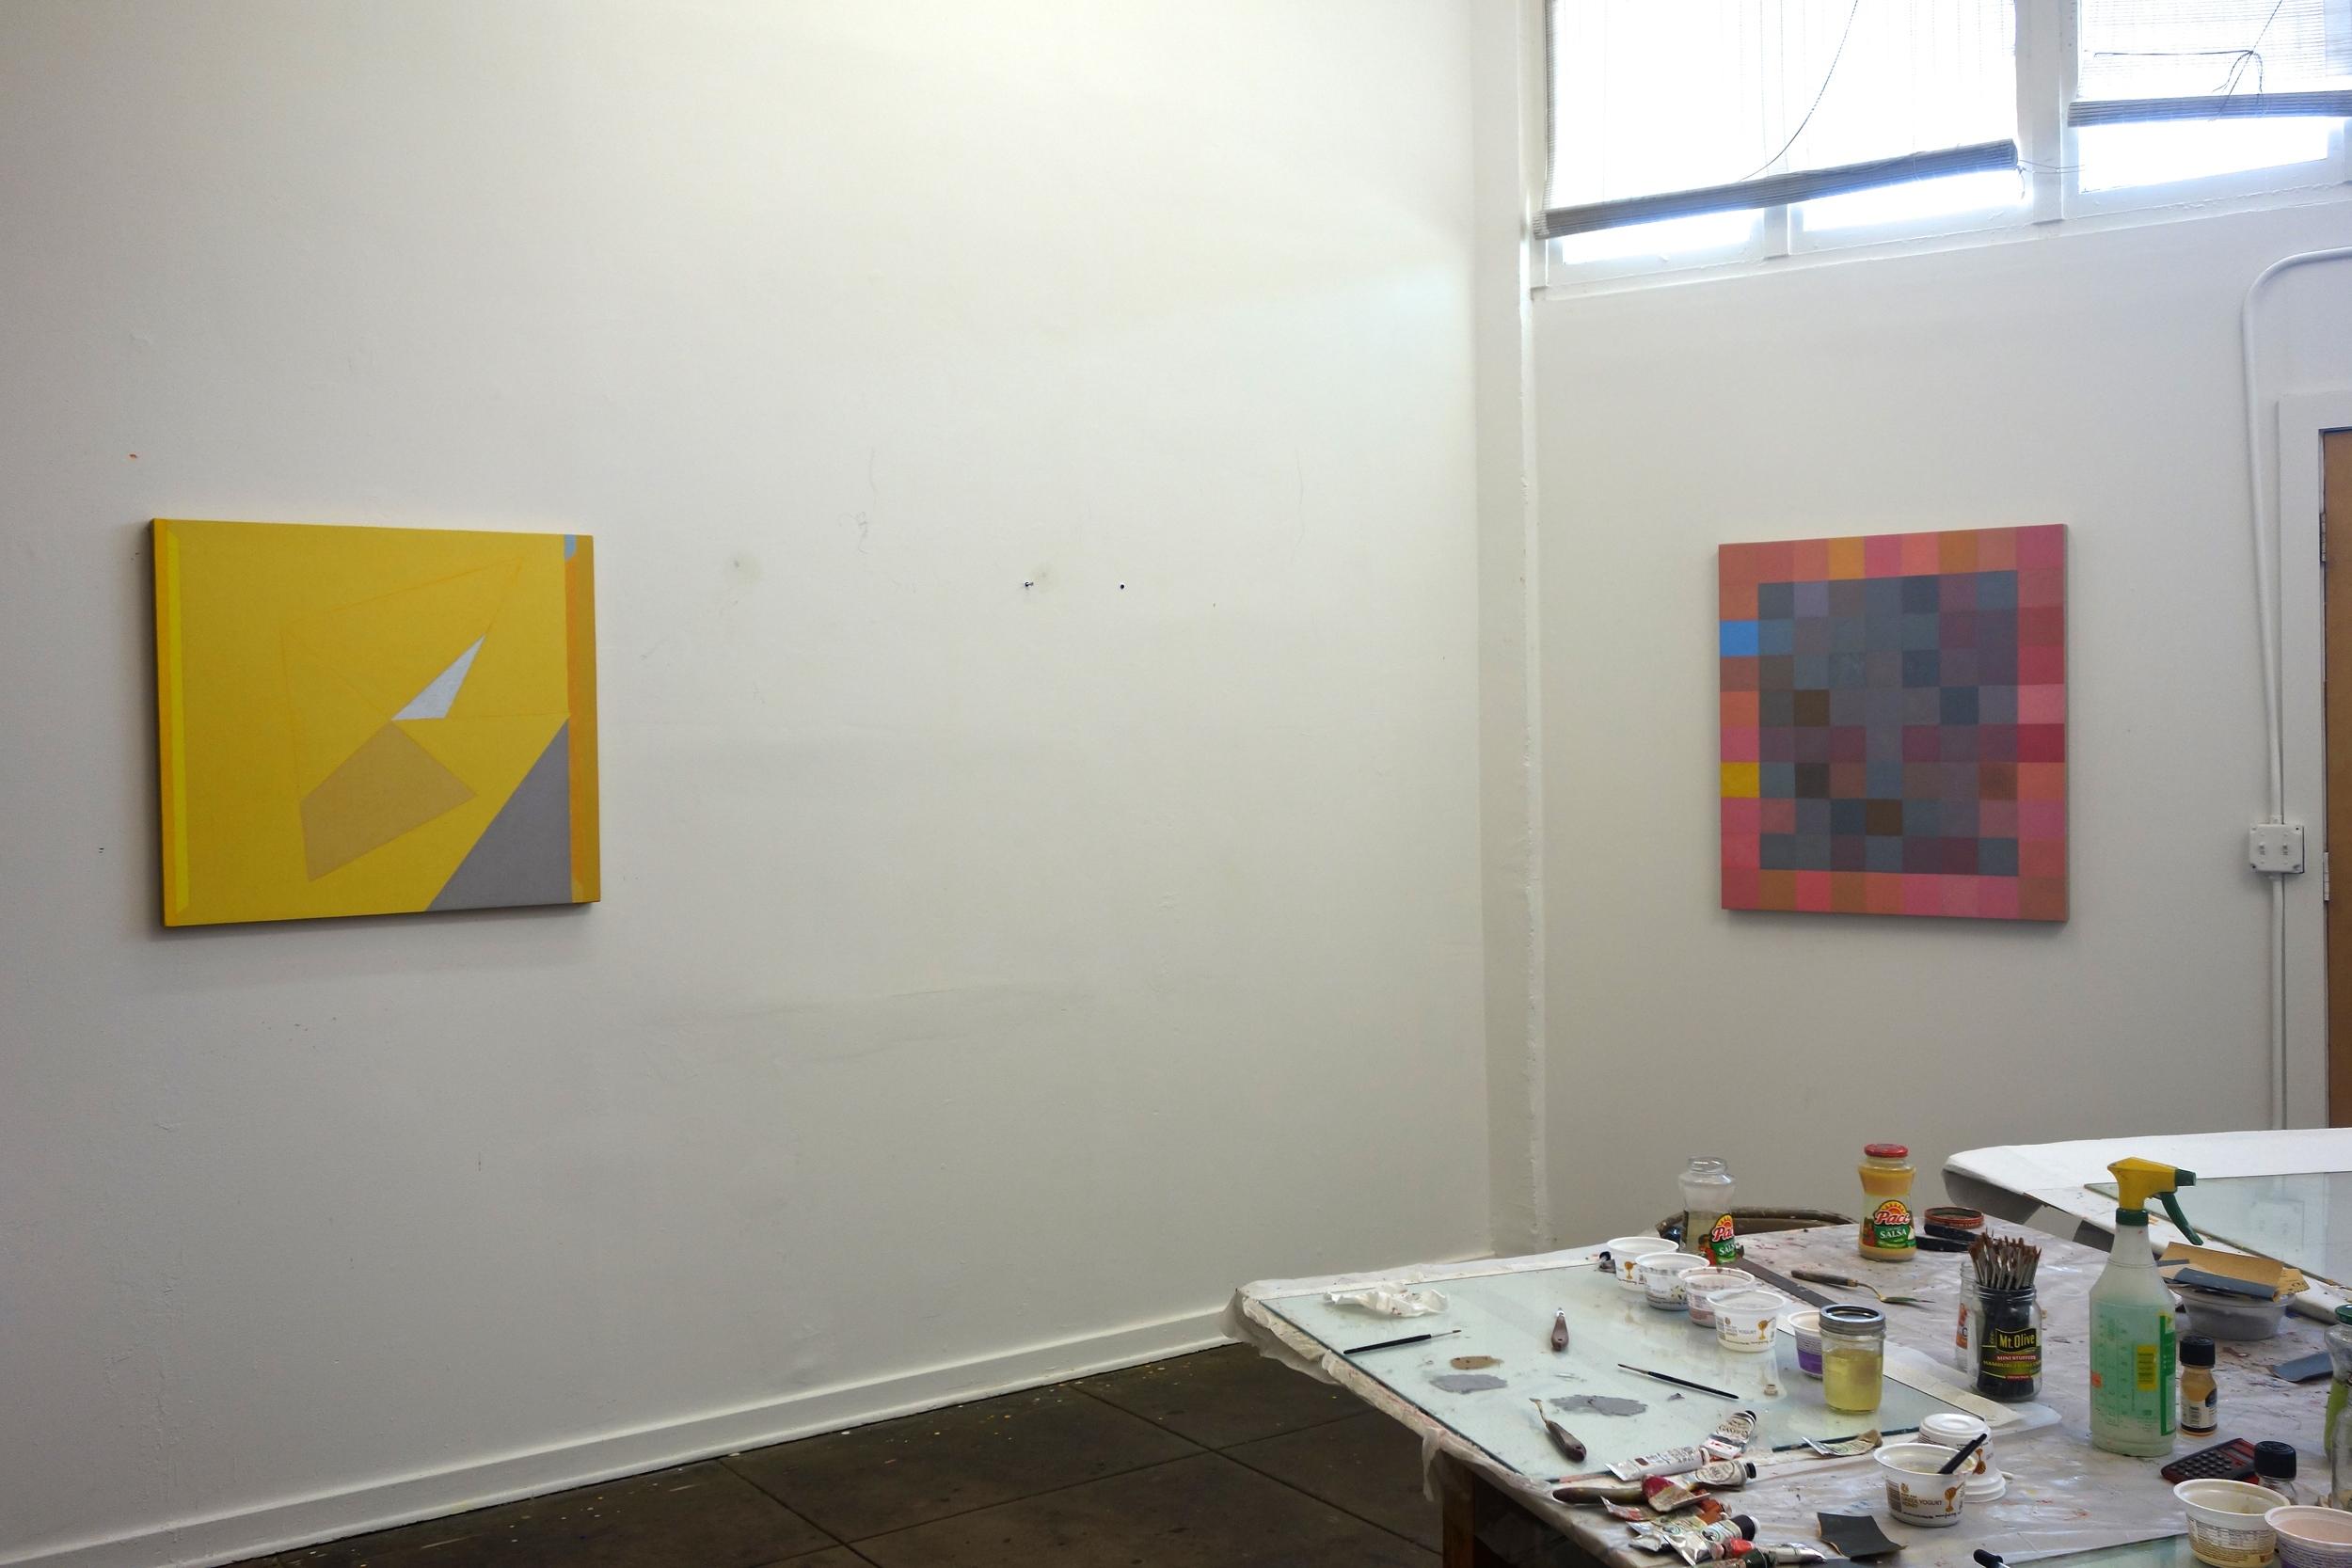 Works on Progress, August 2015